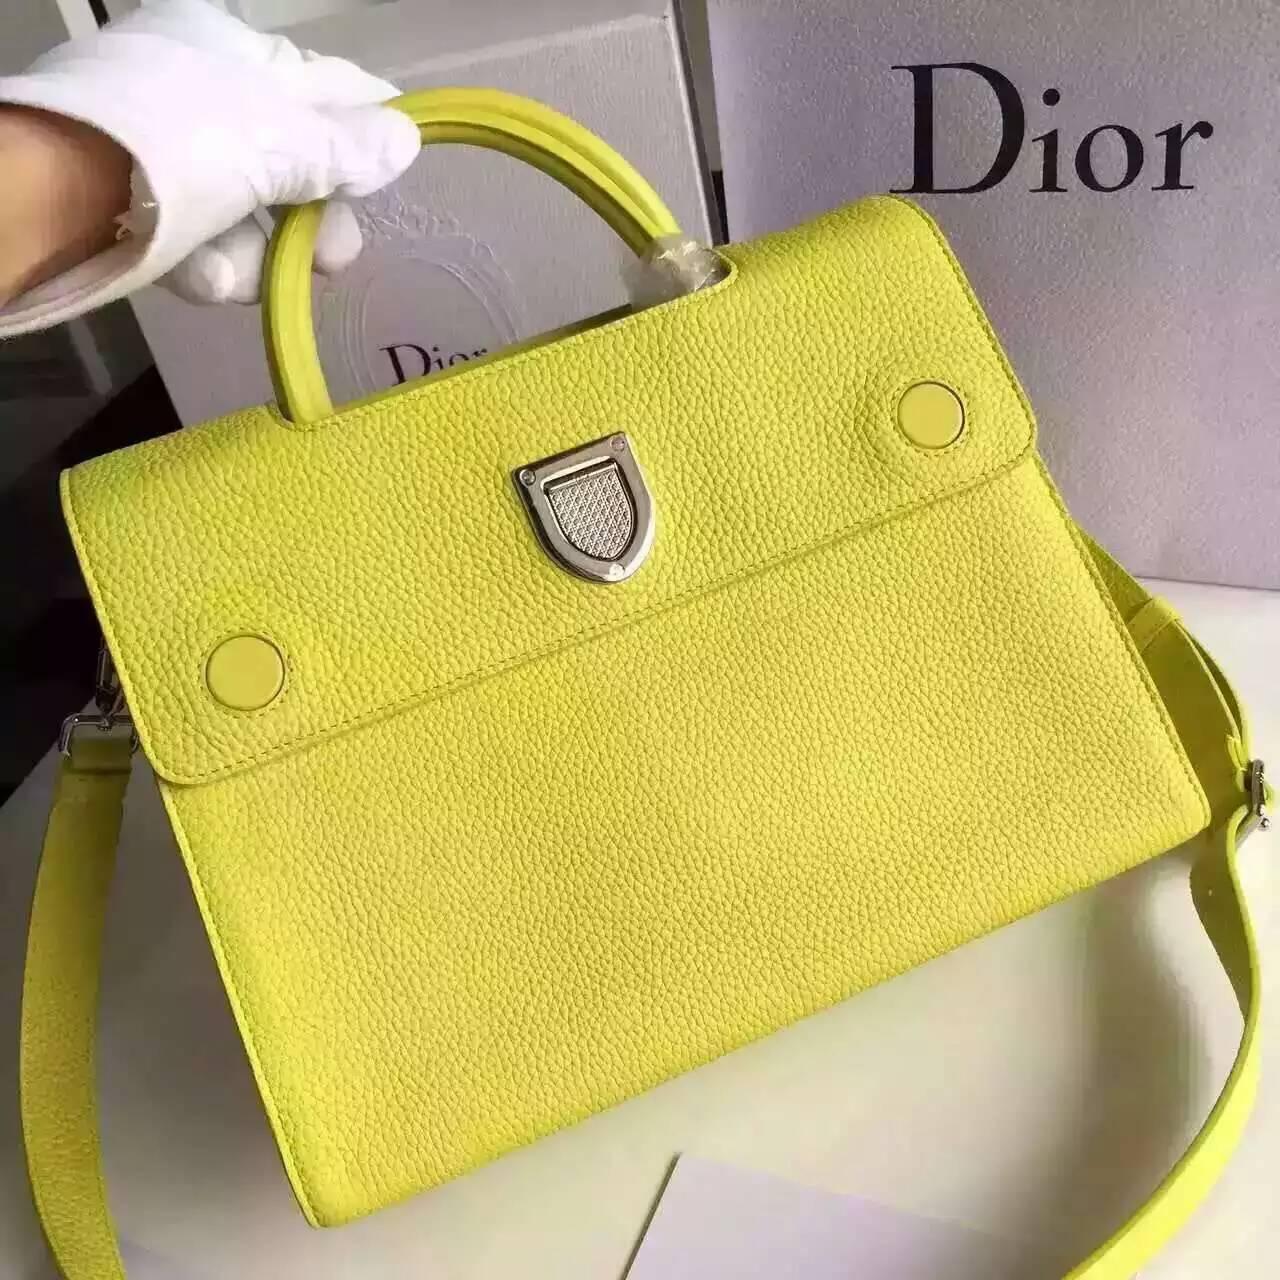 Christian Dior迪奥巴黎走秀款Diorever手提包斜挎包30cm 黄色荔枝纹牛皮